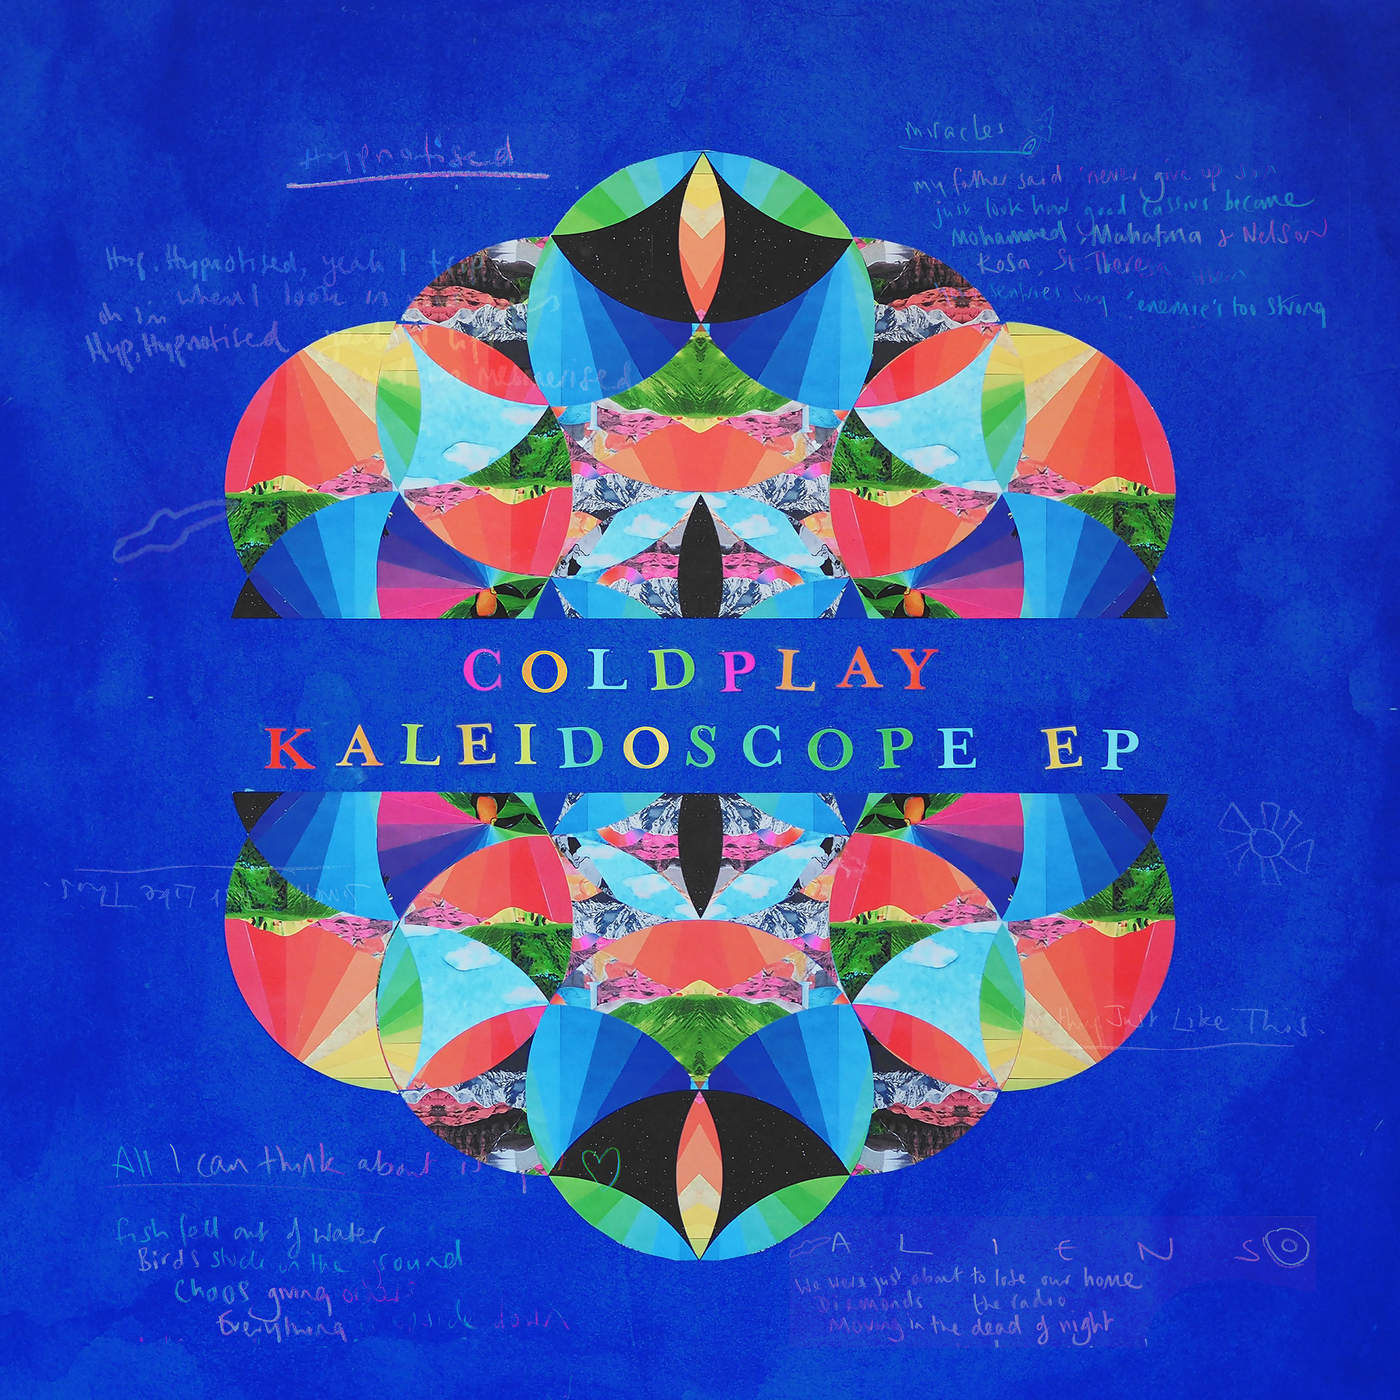 Coldplay - A L I E N S - Single Cover